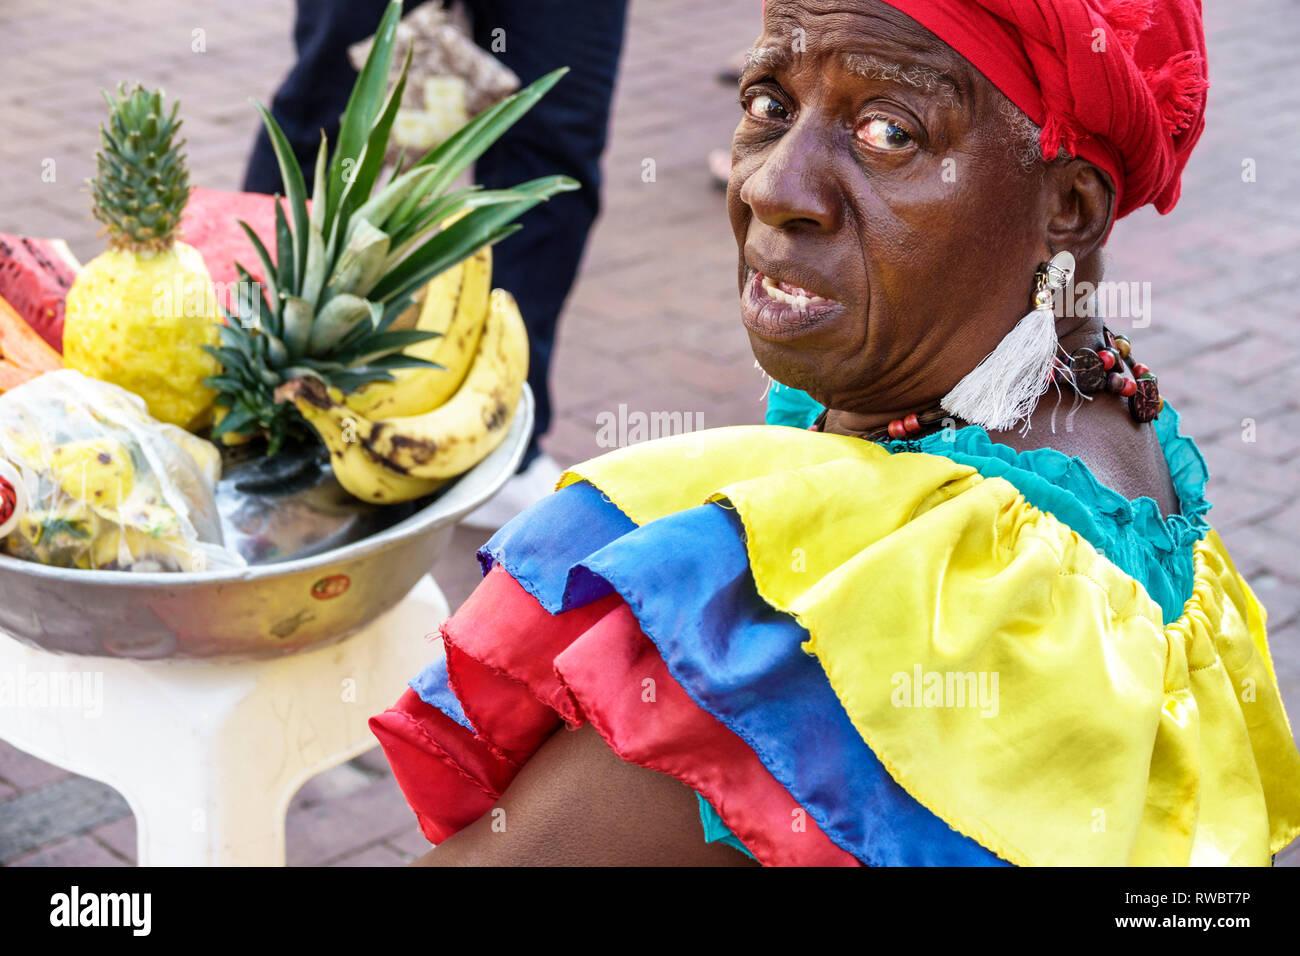 Cartagena Colombia Old Walled City Center centre Centro Plaza San Pedro Claver Black Afro Caribbean Palenquera woman fruit vendor traditional costume - Stock Image